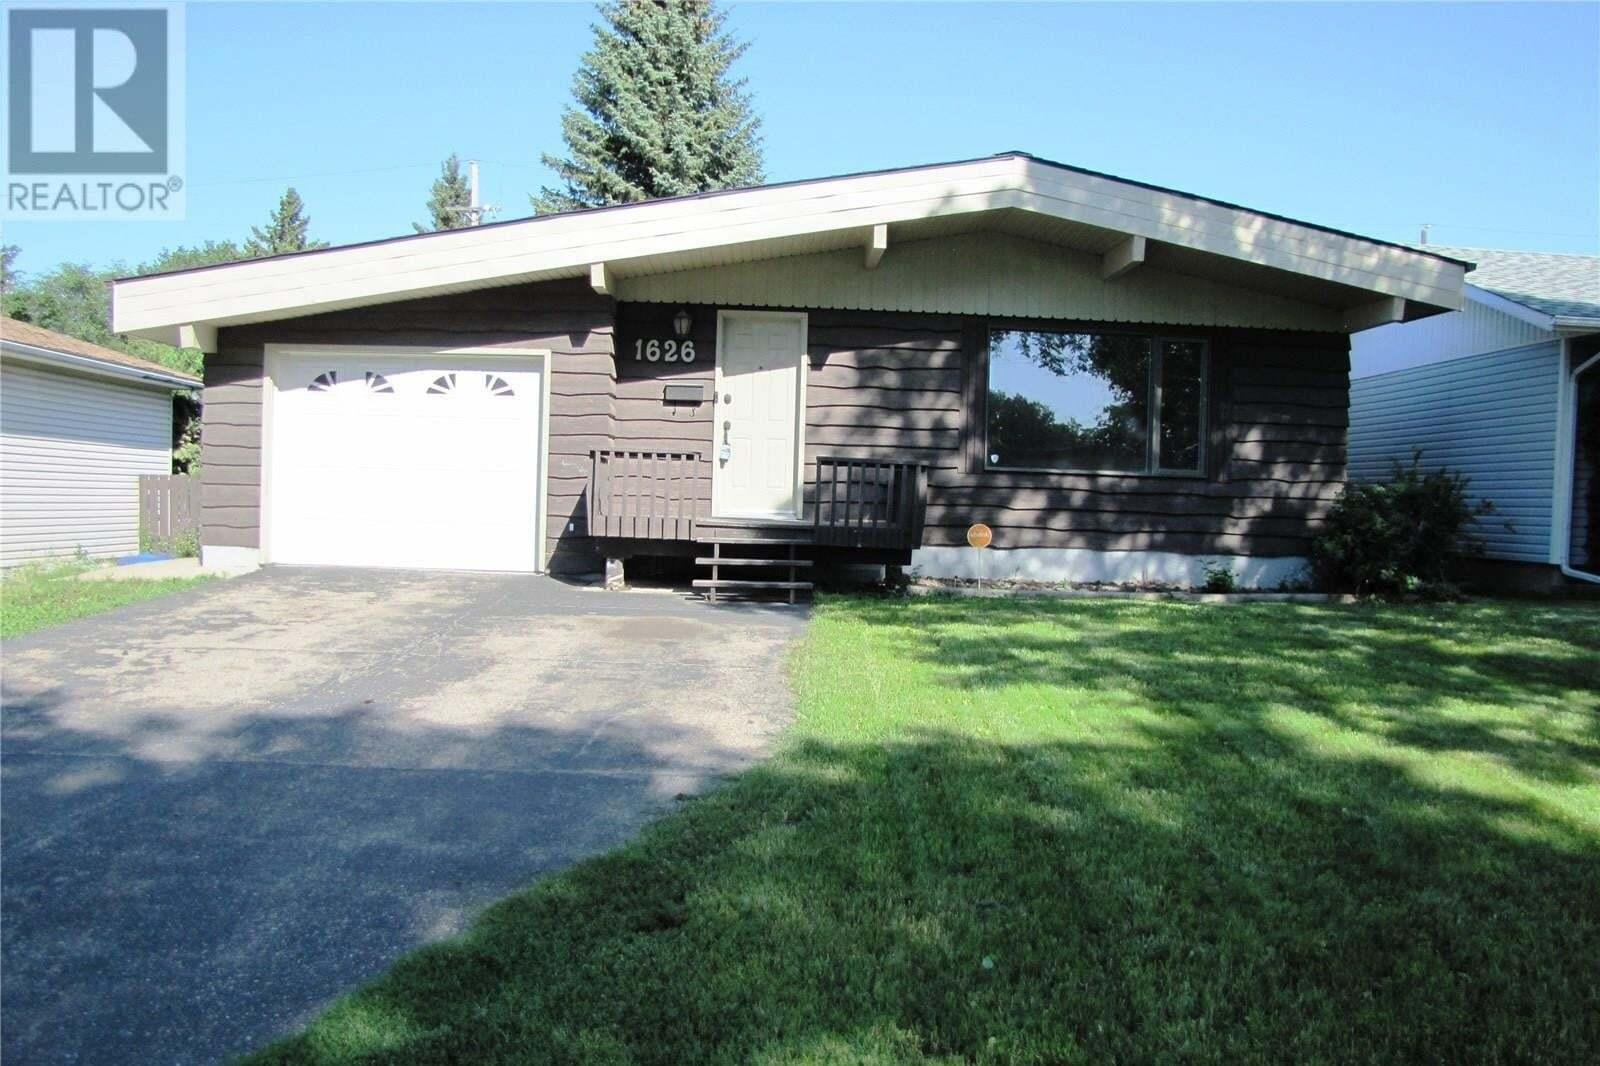 House for sale at 1626 H Ave N Saskatoon Saskatchewan - MLS: SK830963